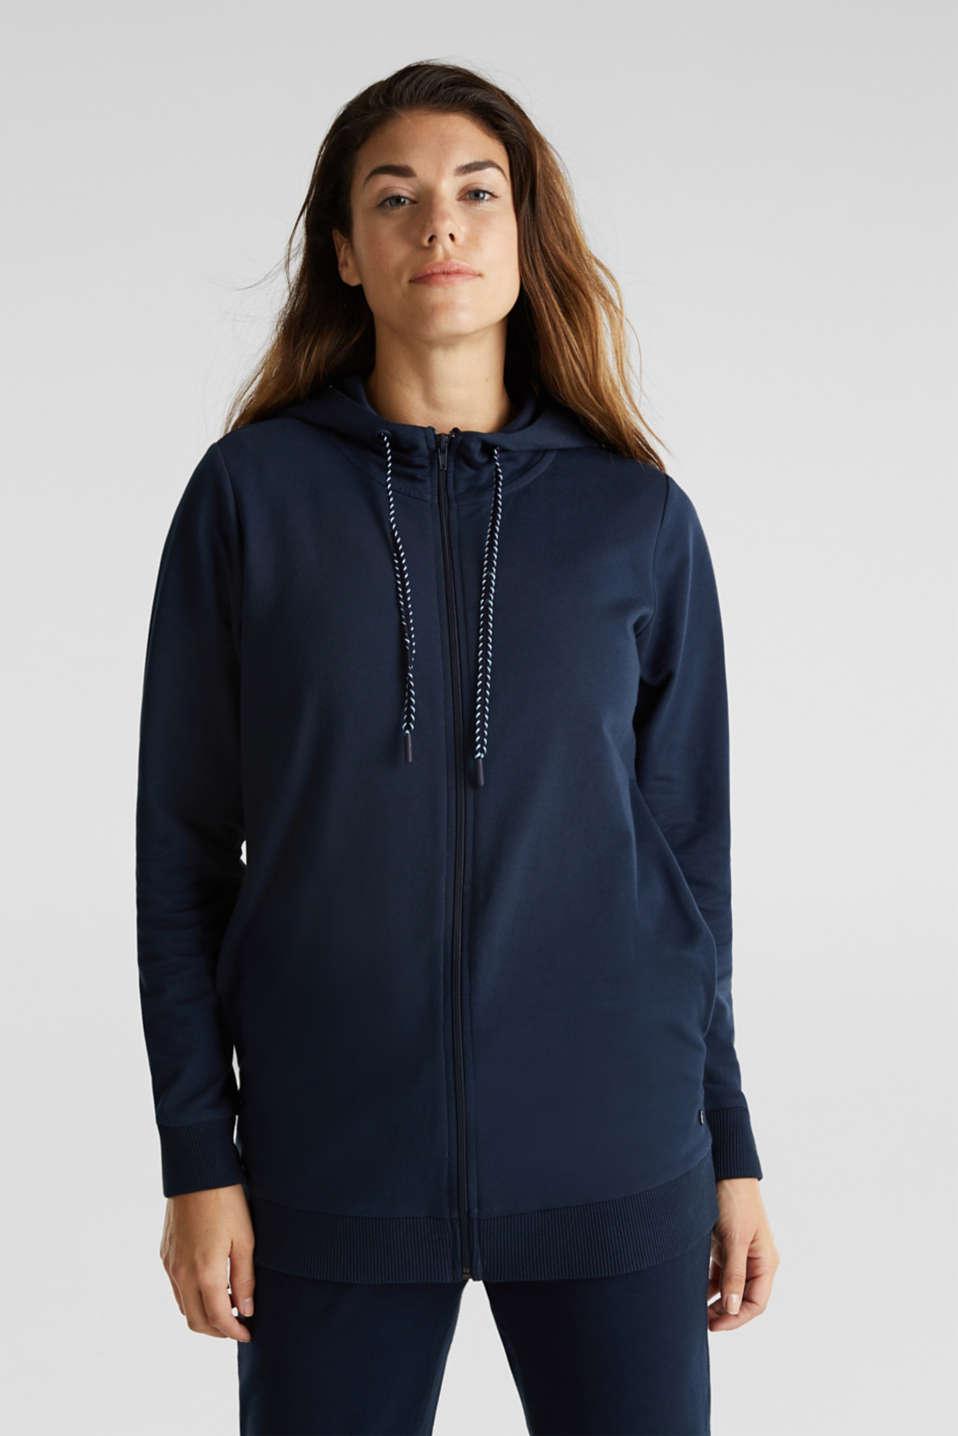 3-way, hooded sweatshirt jacket, LCNIGHT BLUE, detail image number 1